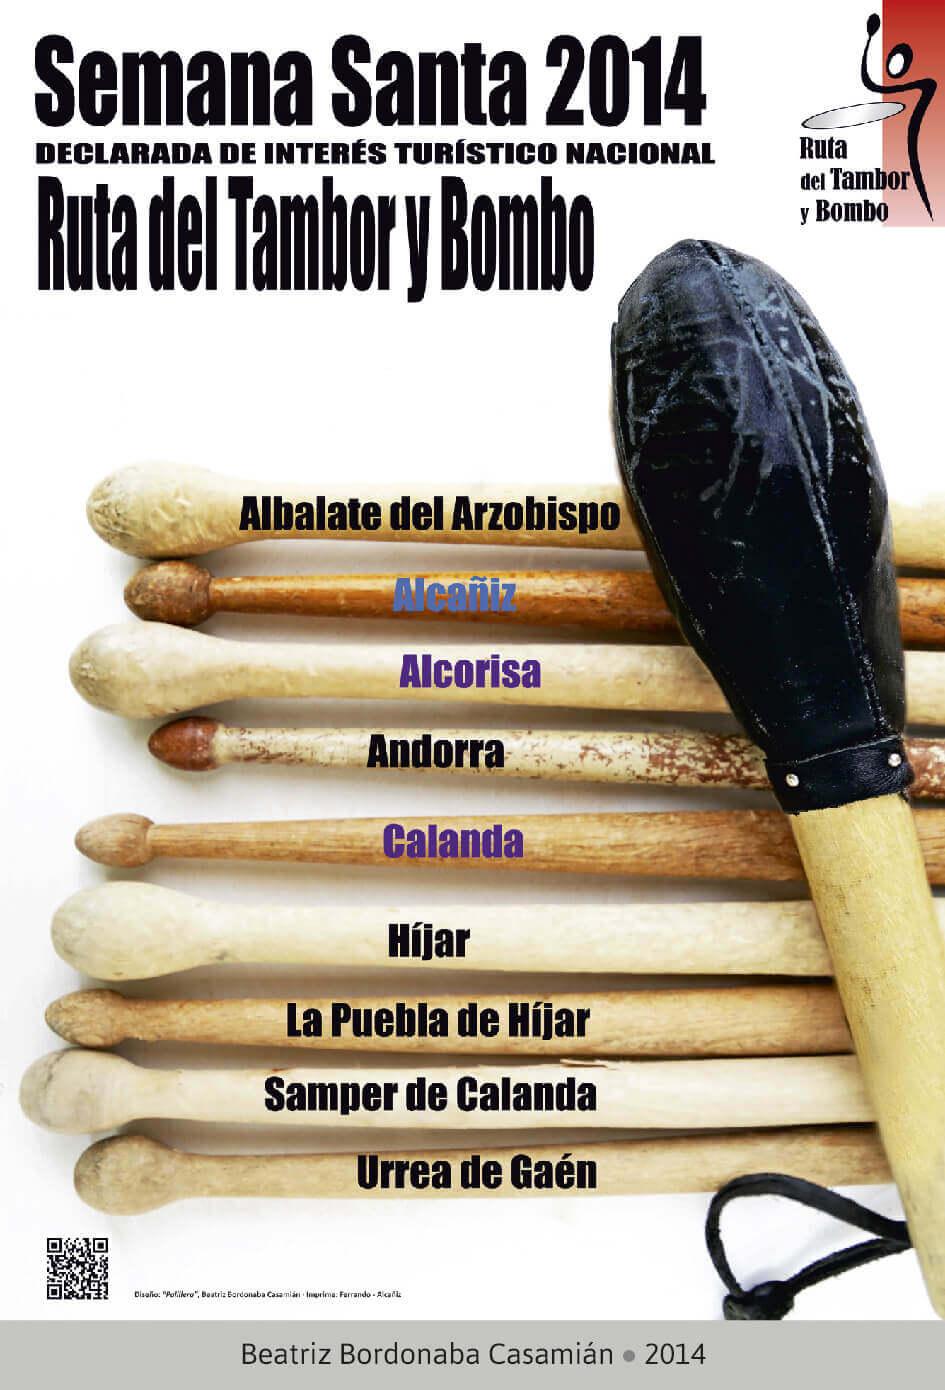 Cartel Ganador Ruta del Tambor y Bombo. Semana Santa 2014